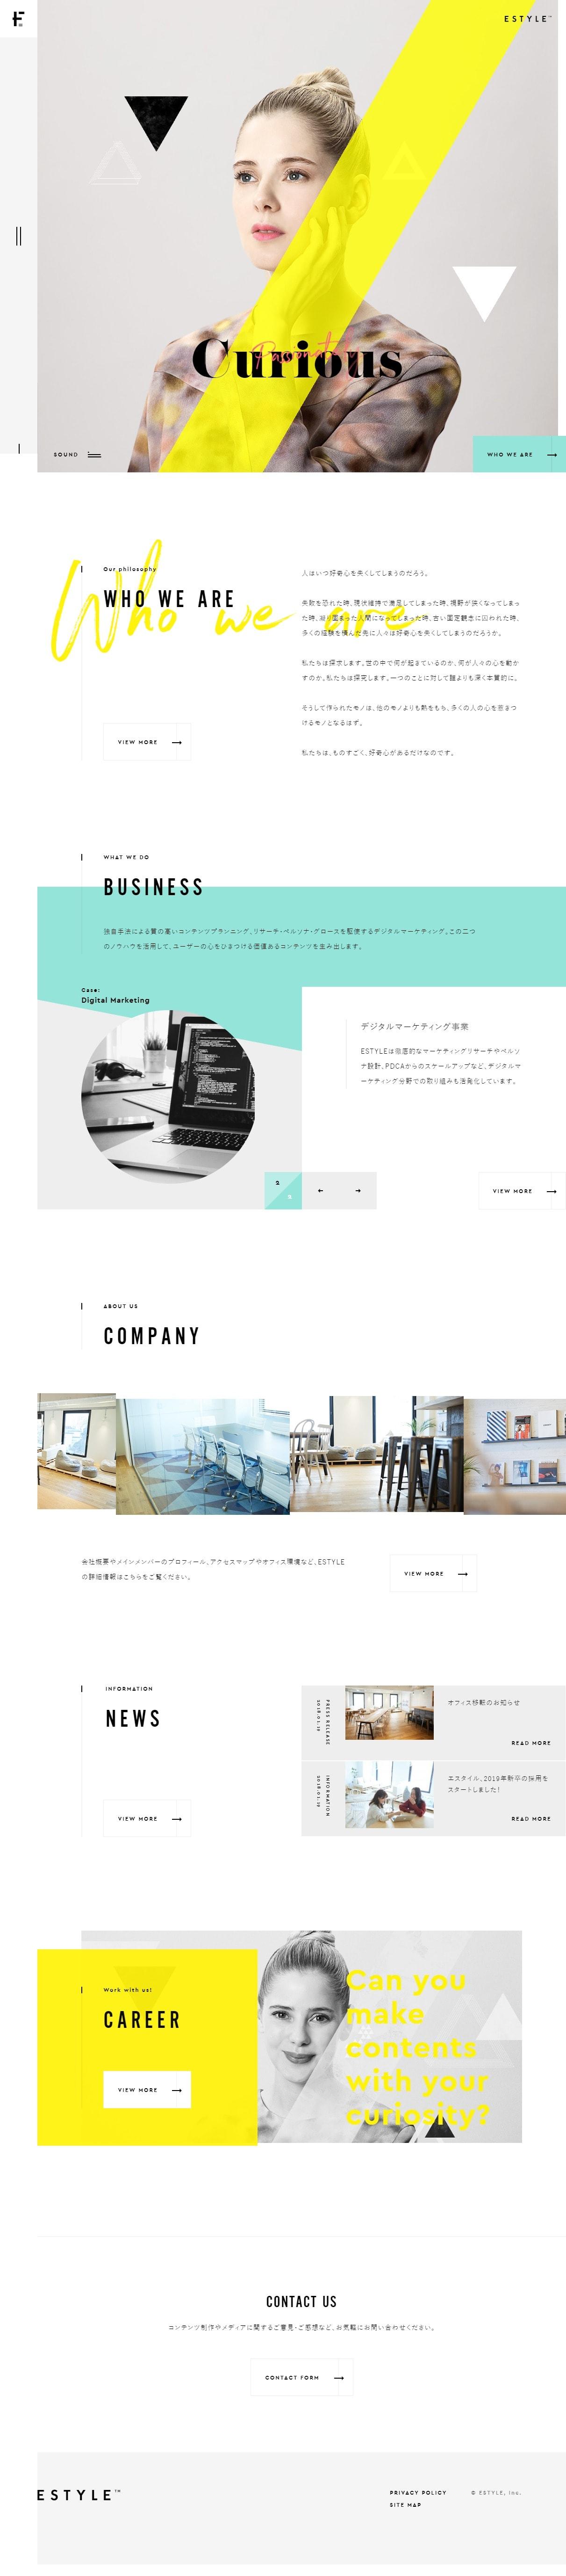 ESTYLE,Inc. | 株式会社エスタイルのコーポレートサイト